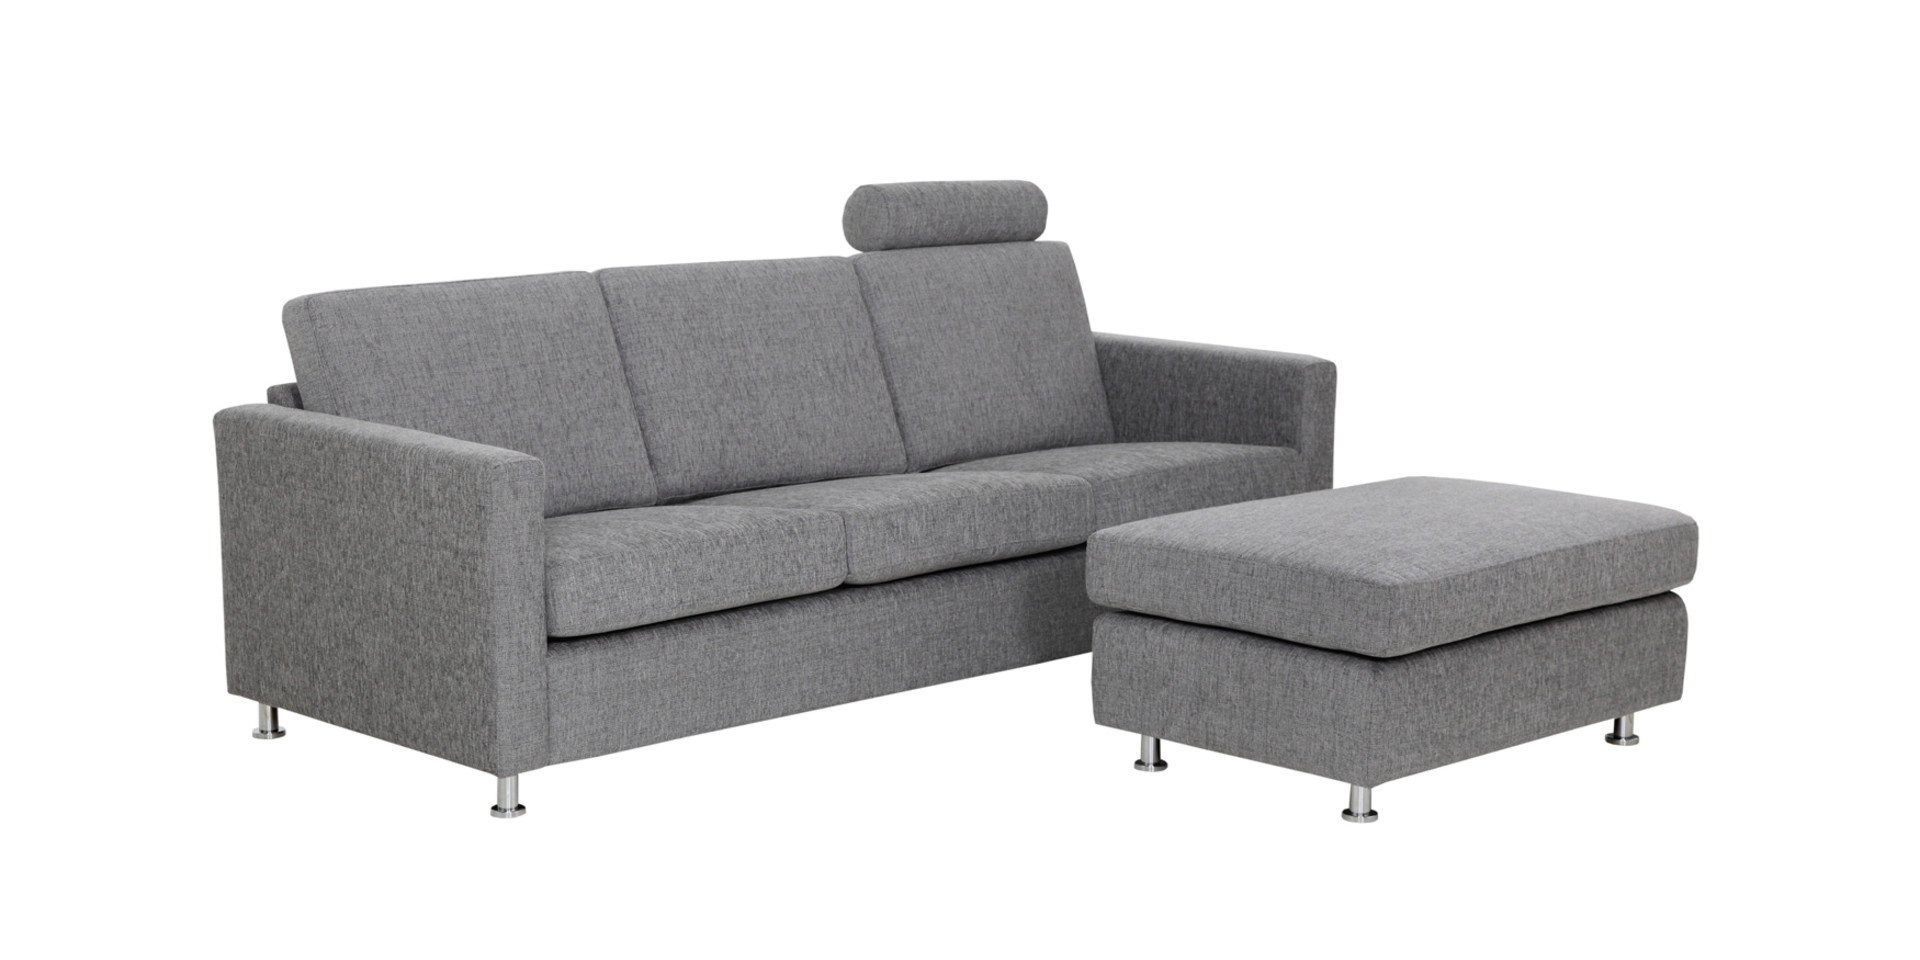 sits-palma-canape-pouf-3seater_footstool_headrest_veraam1c9grey_2